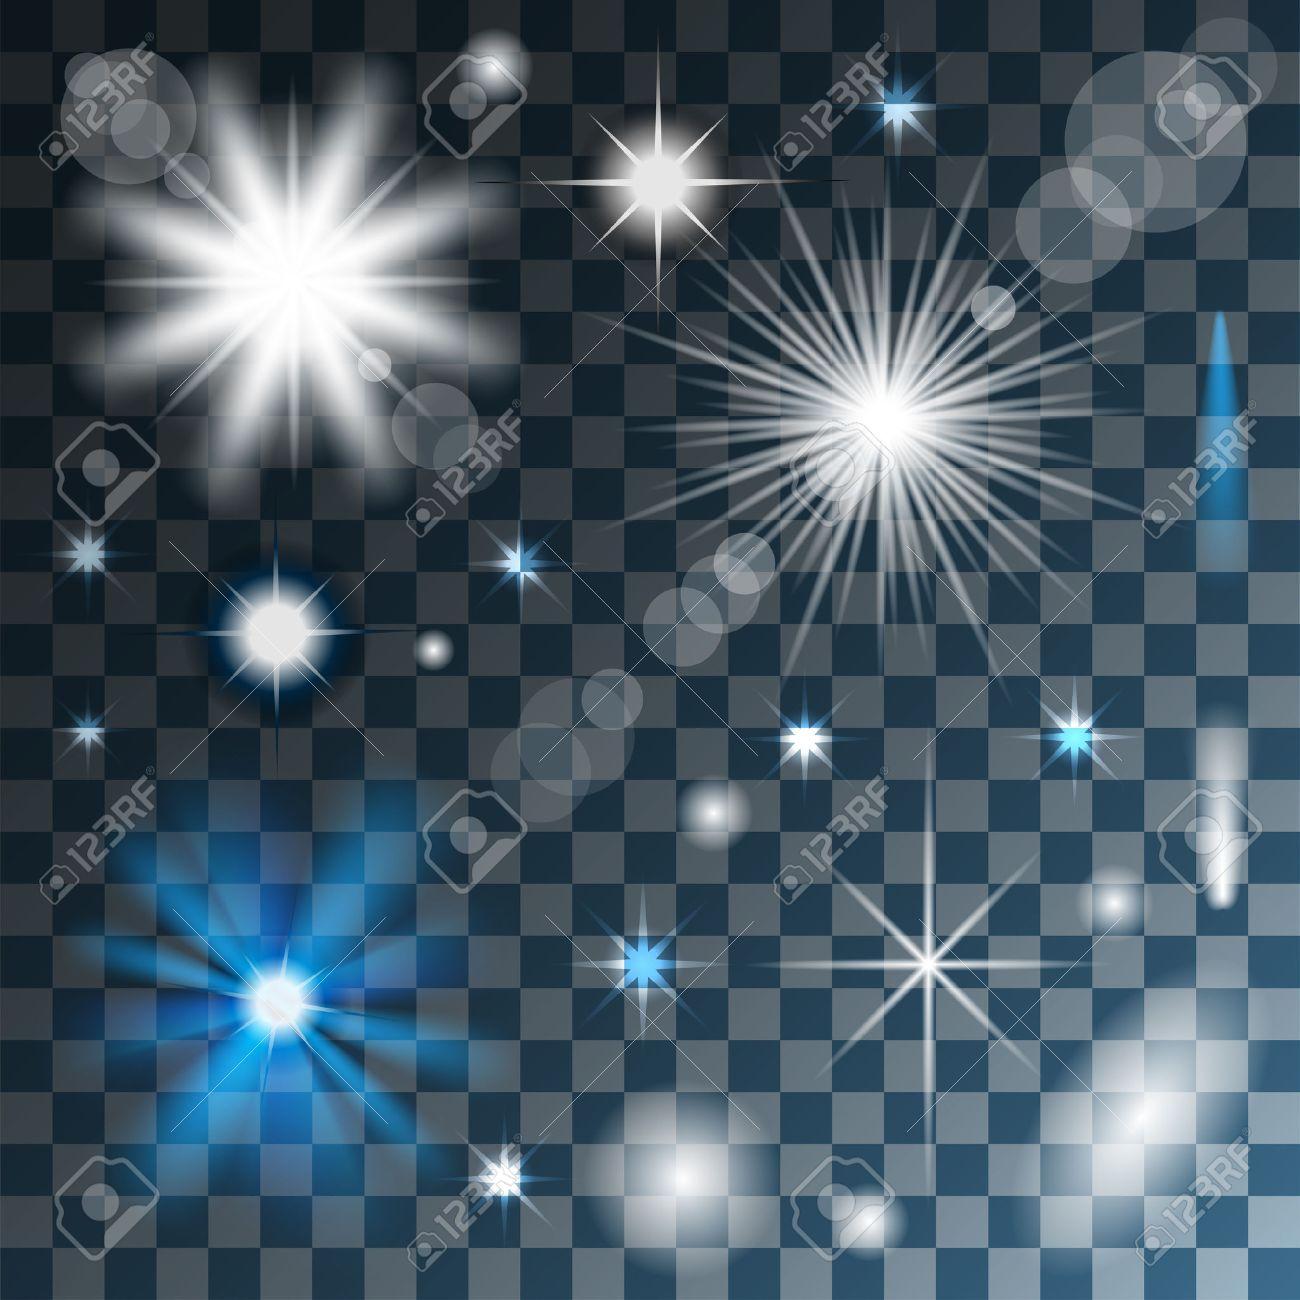 Glowing stars, lights and sparkles on Transparent background. Vector. Illustration. Standard-Bild - 39017899